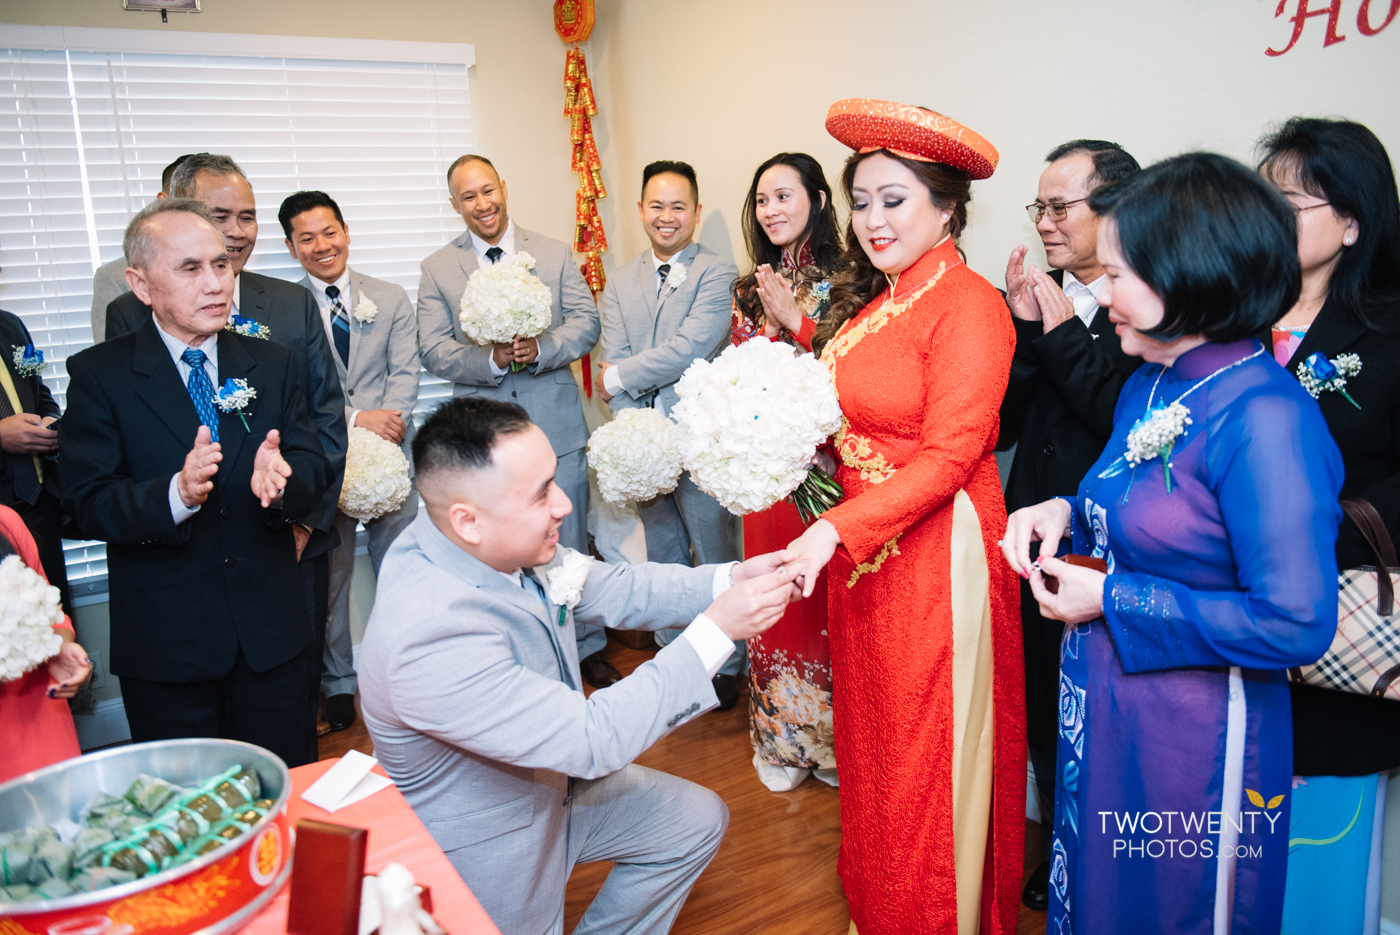 university-of-the-pacific-sacramento-wedding-photographer-111